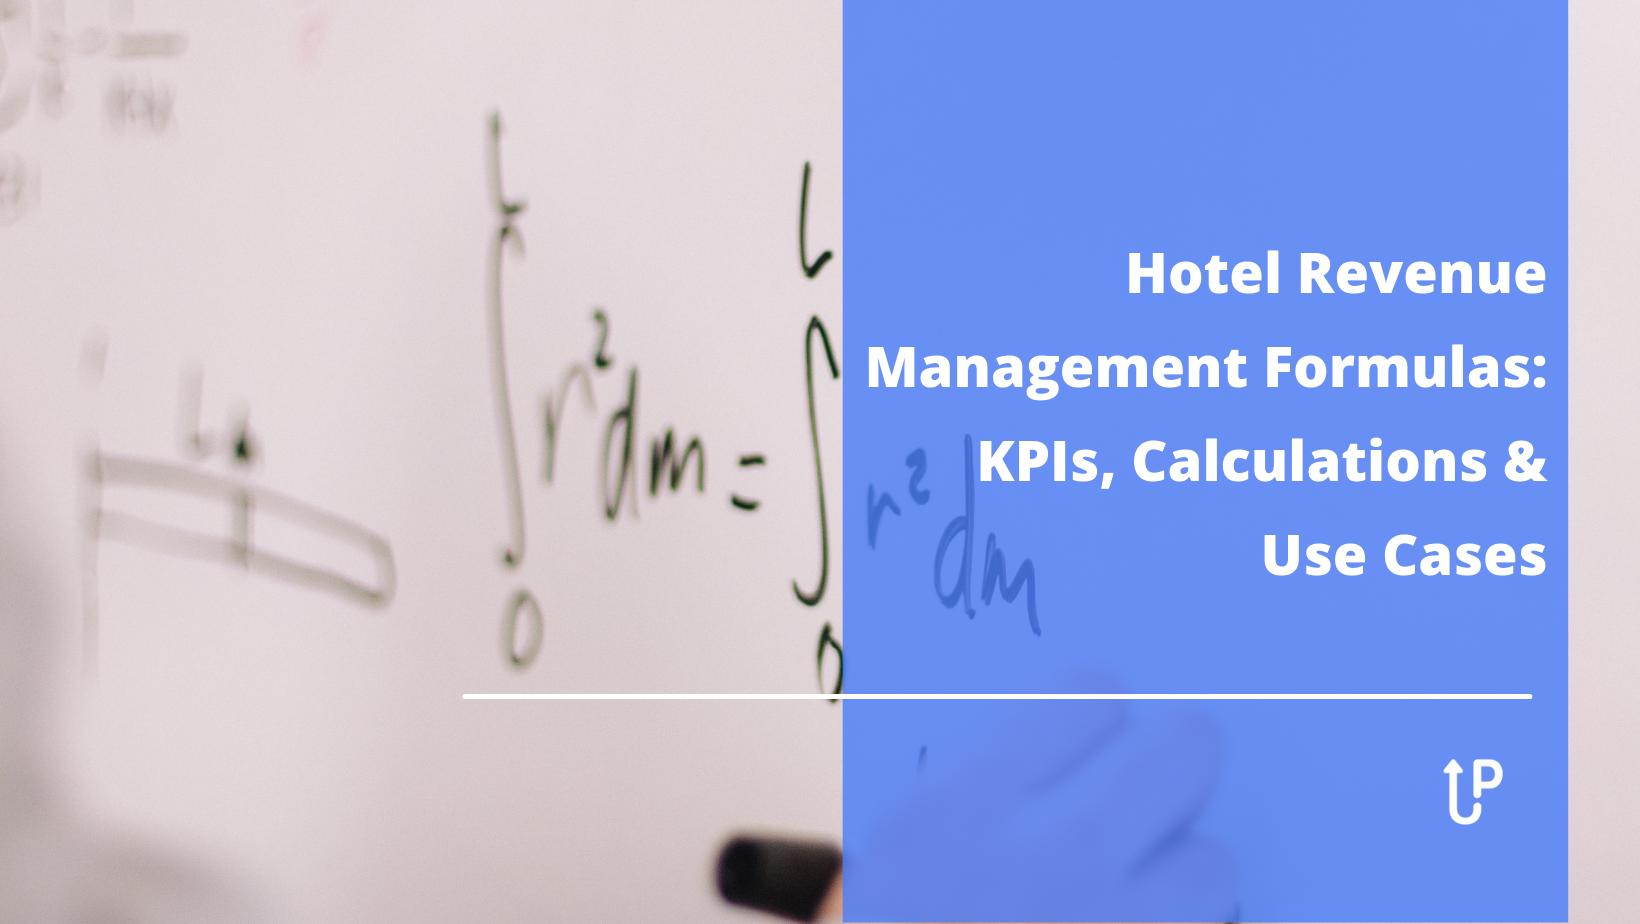 hotel revenue management formulas